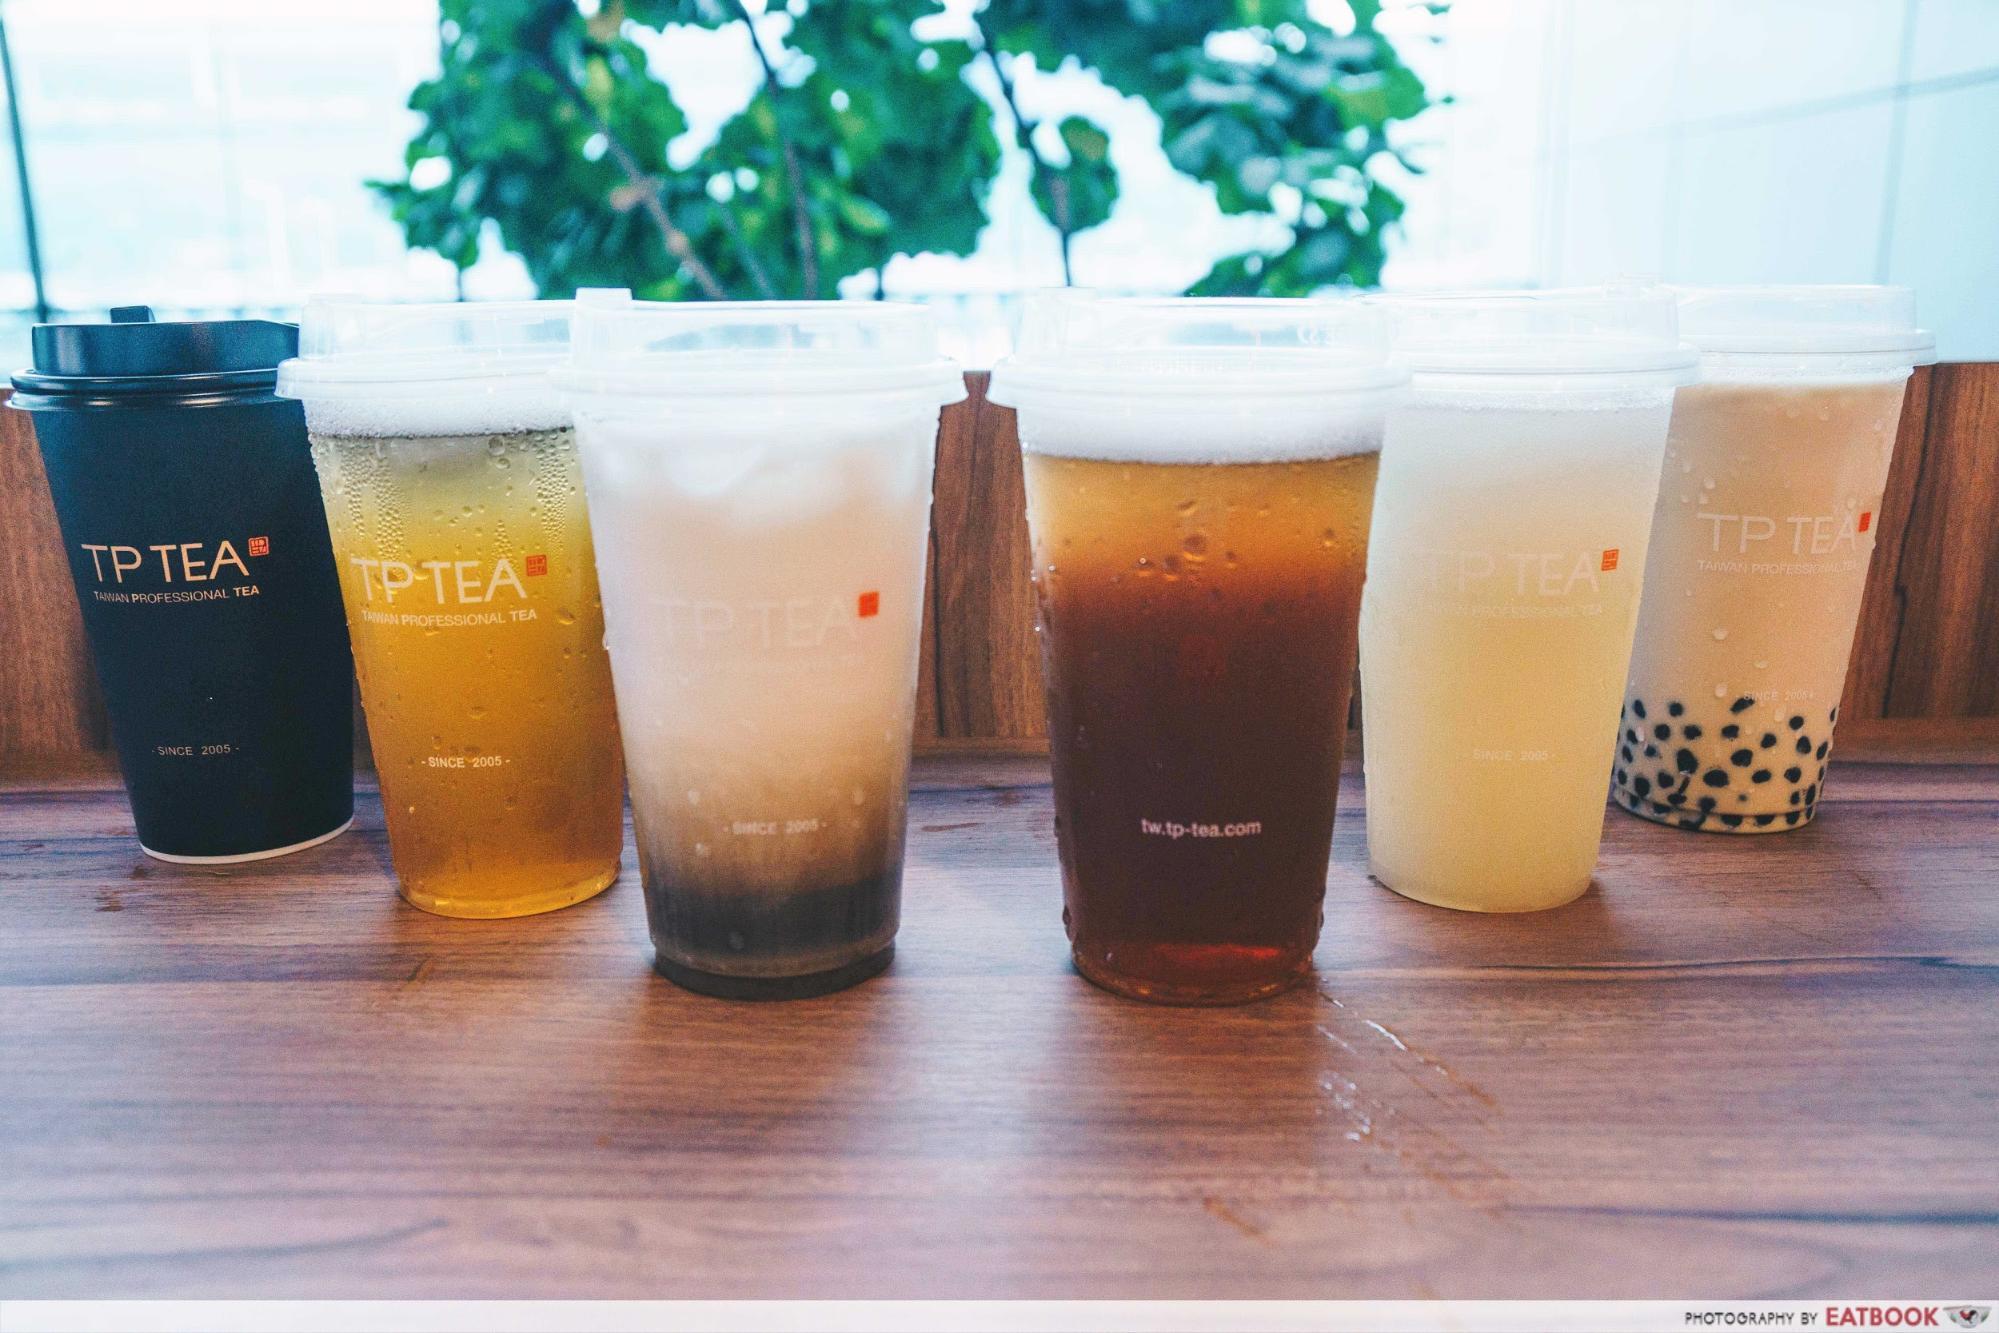 TP Tea - More Variety